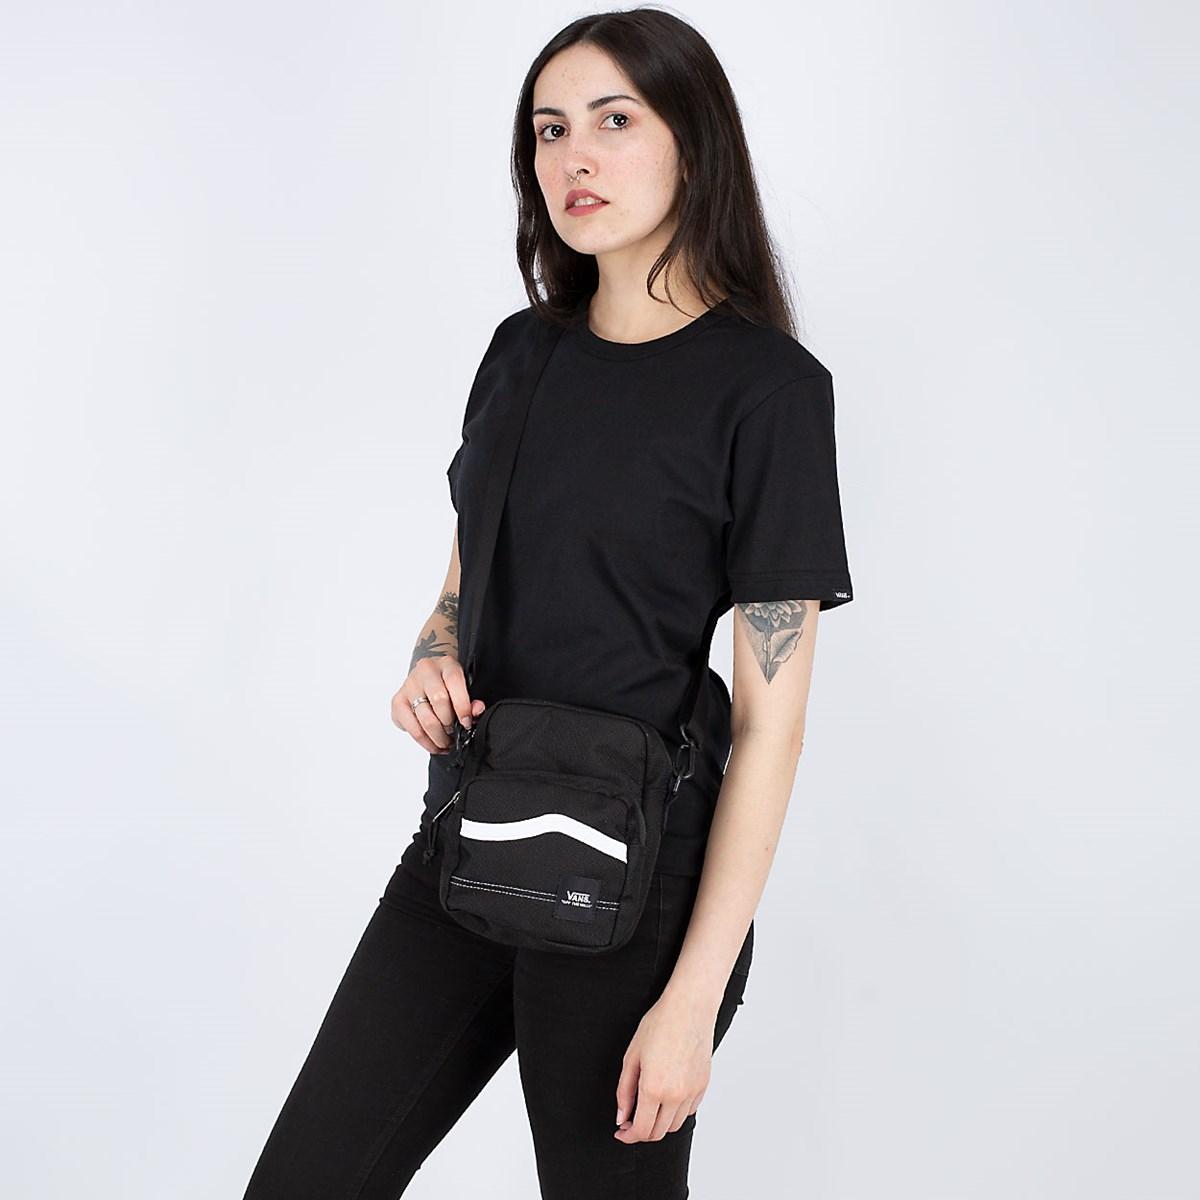 Bolsa Vans Construct Shoulder Bag Black White VN0A4RWZY28